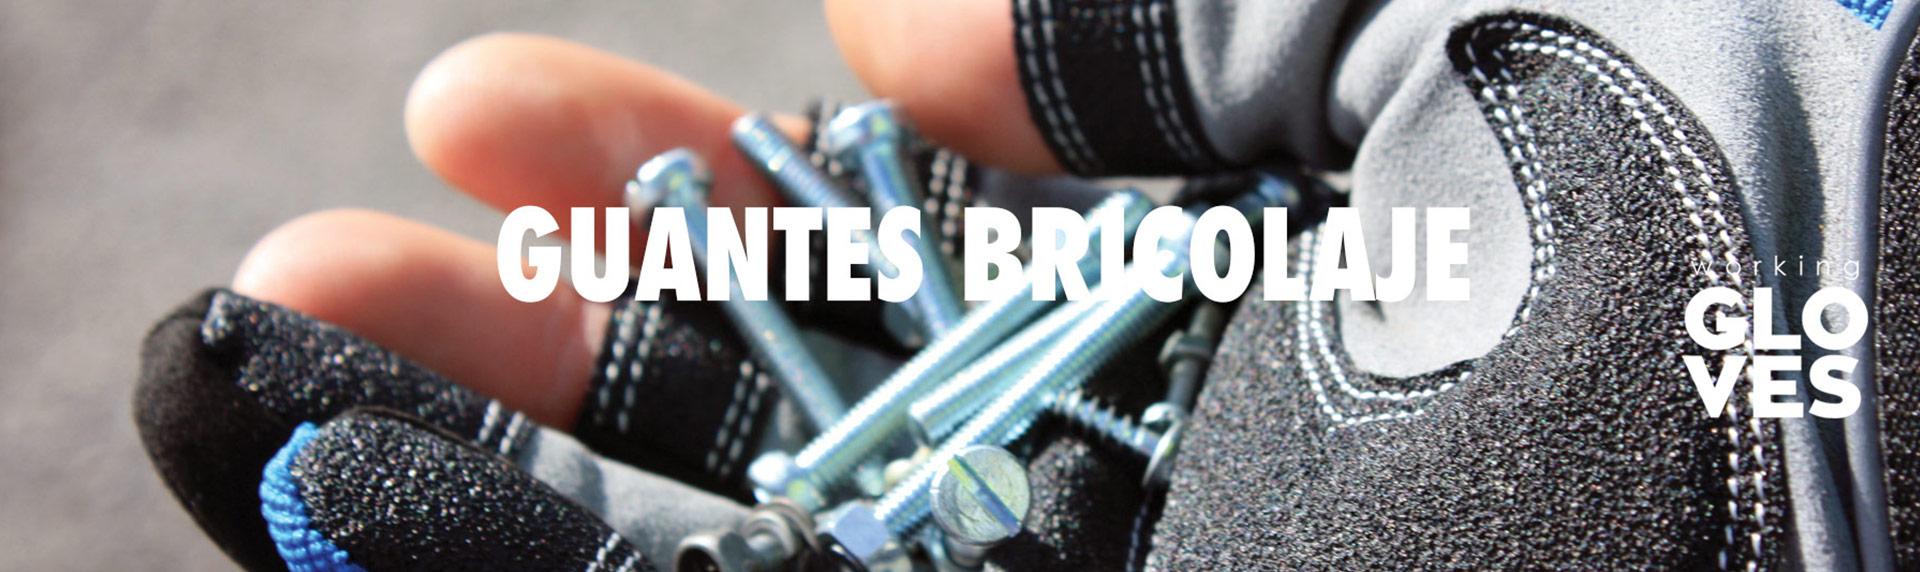 GUANTES_BRICOTEC